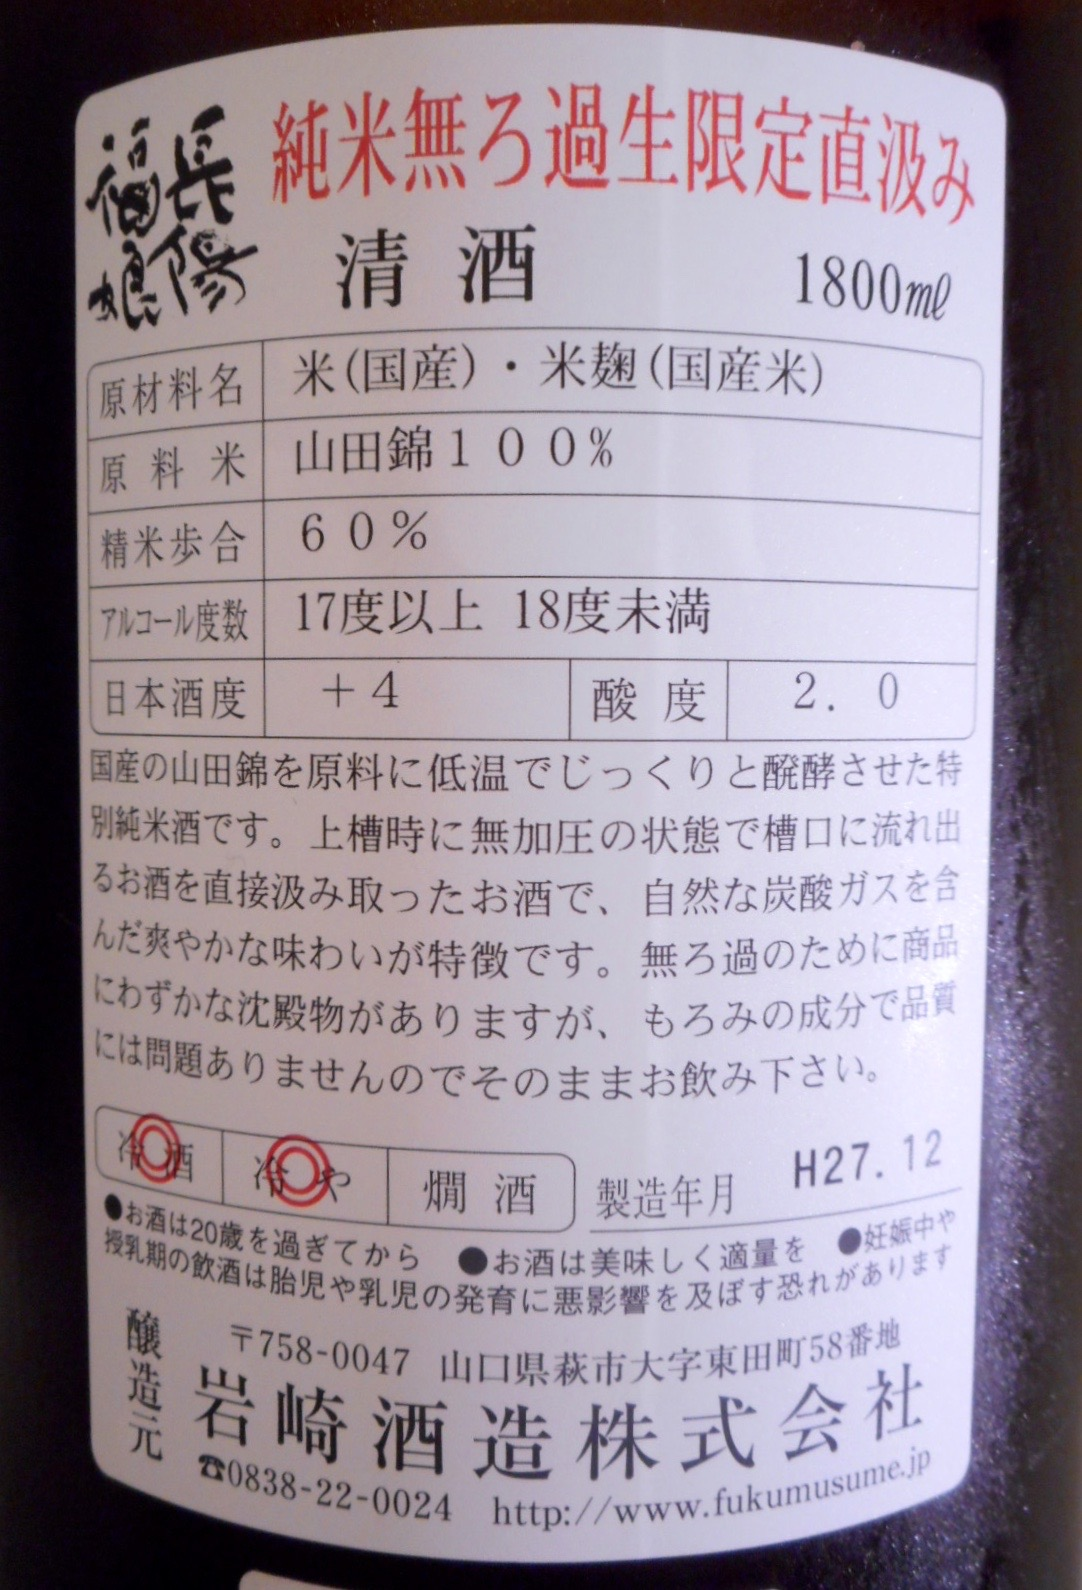 chouyoufukumusume_jikagumi_yamada60_3.jpg